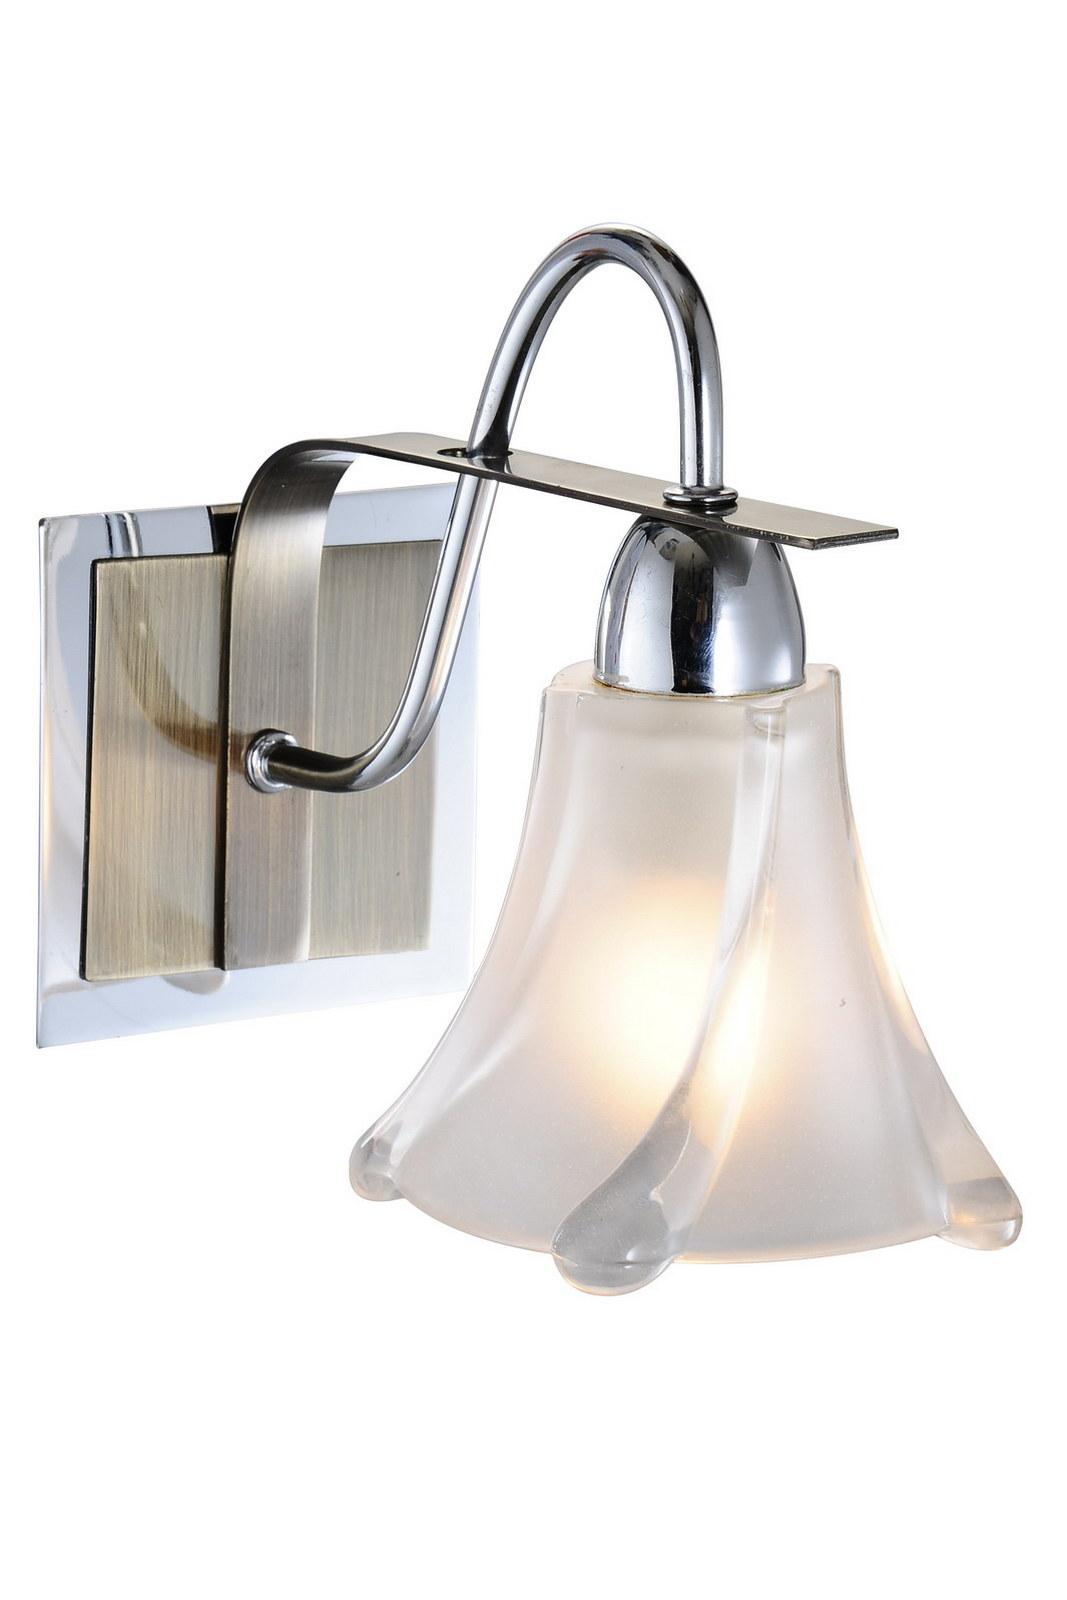 Бра МАКСИСВЕТ Н Еврокаркасы 03006w/1 cr+antique brass бра максисвет н медь со стеклом sb07001 02